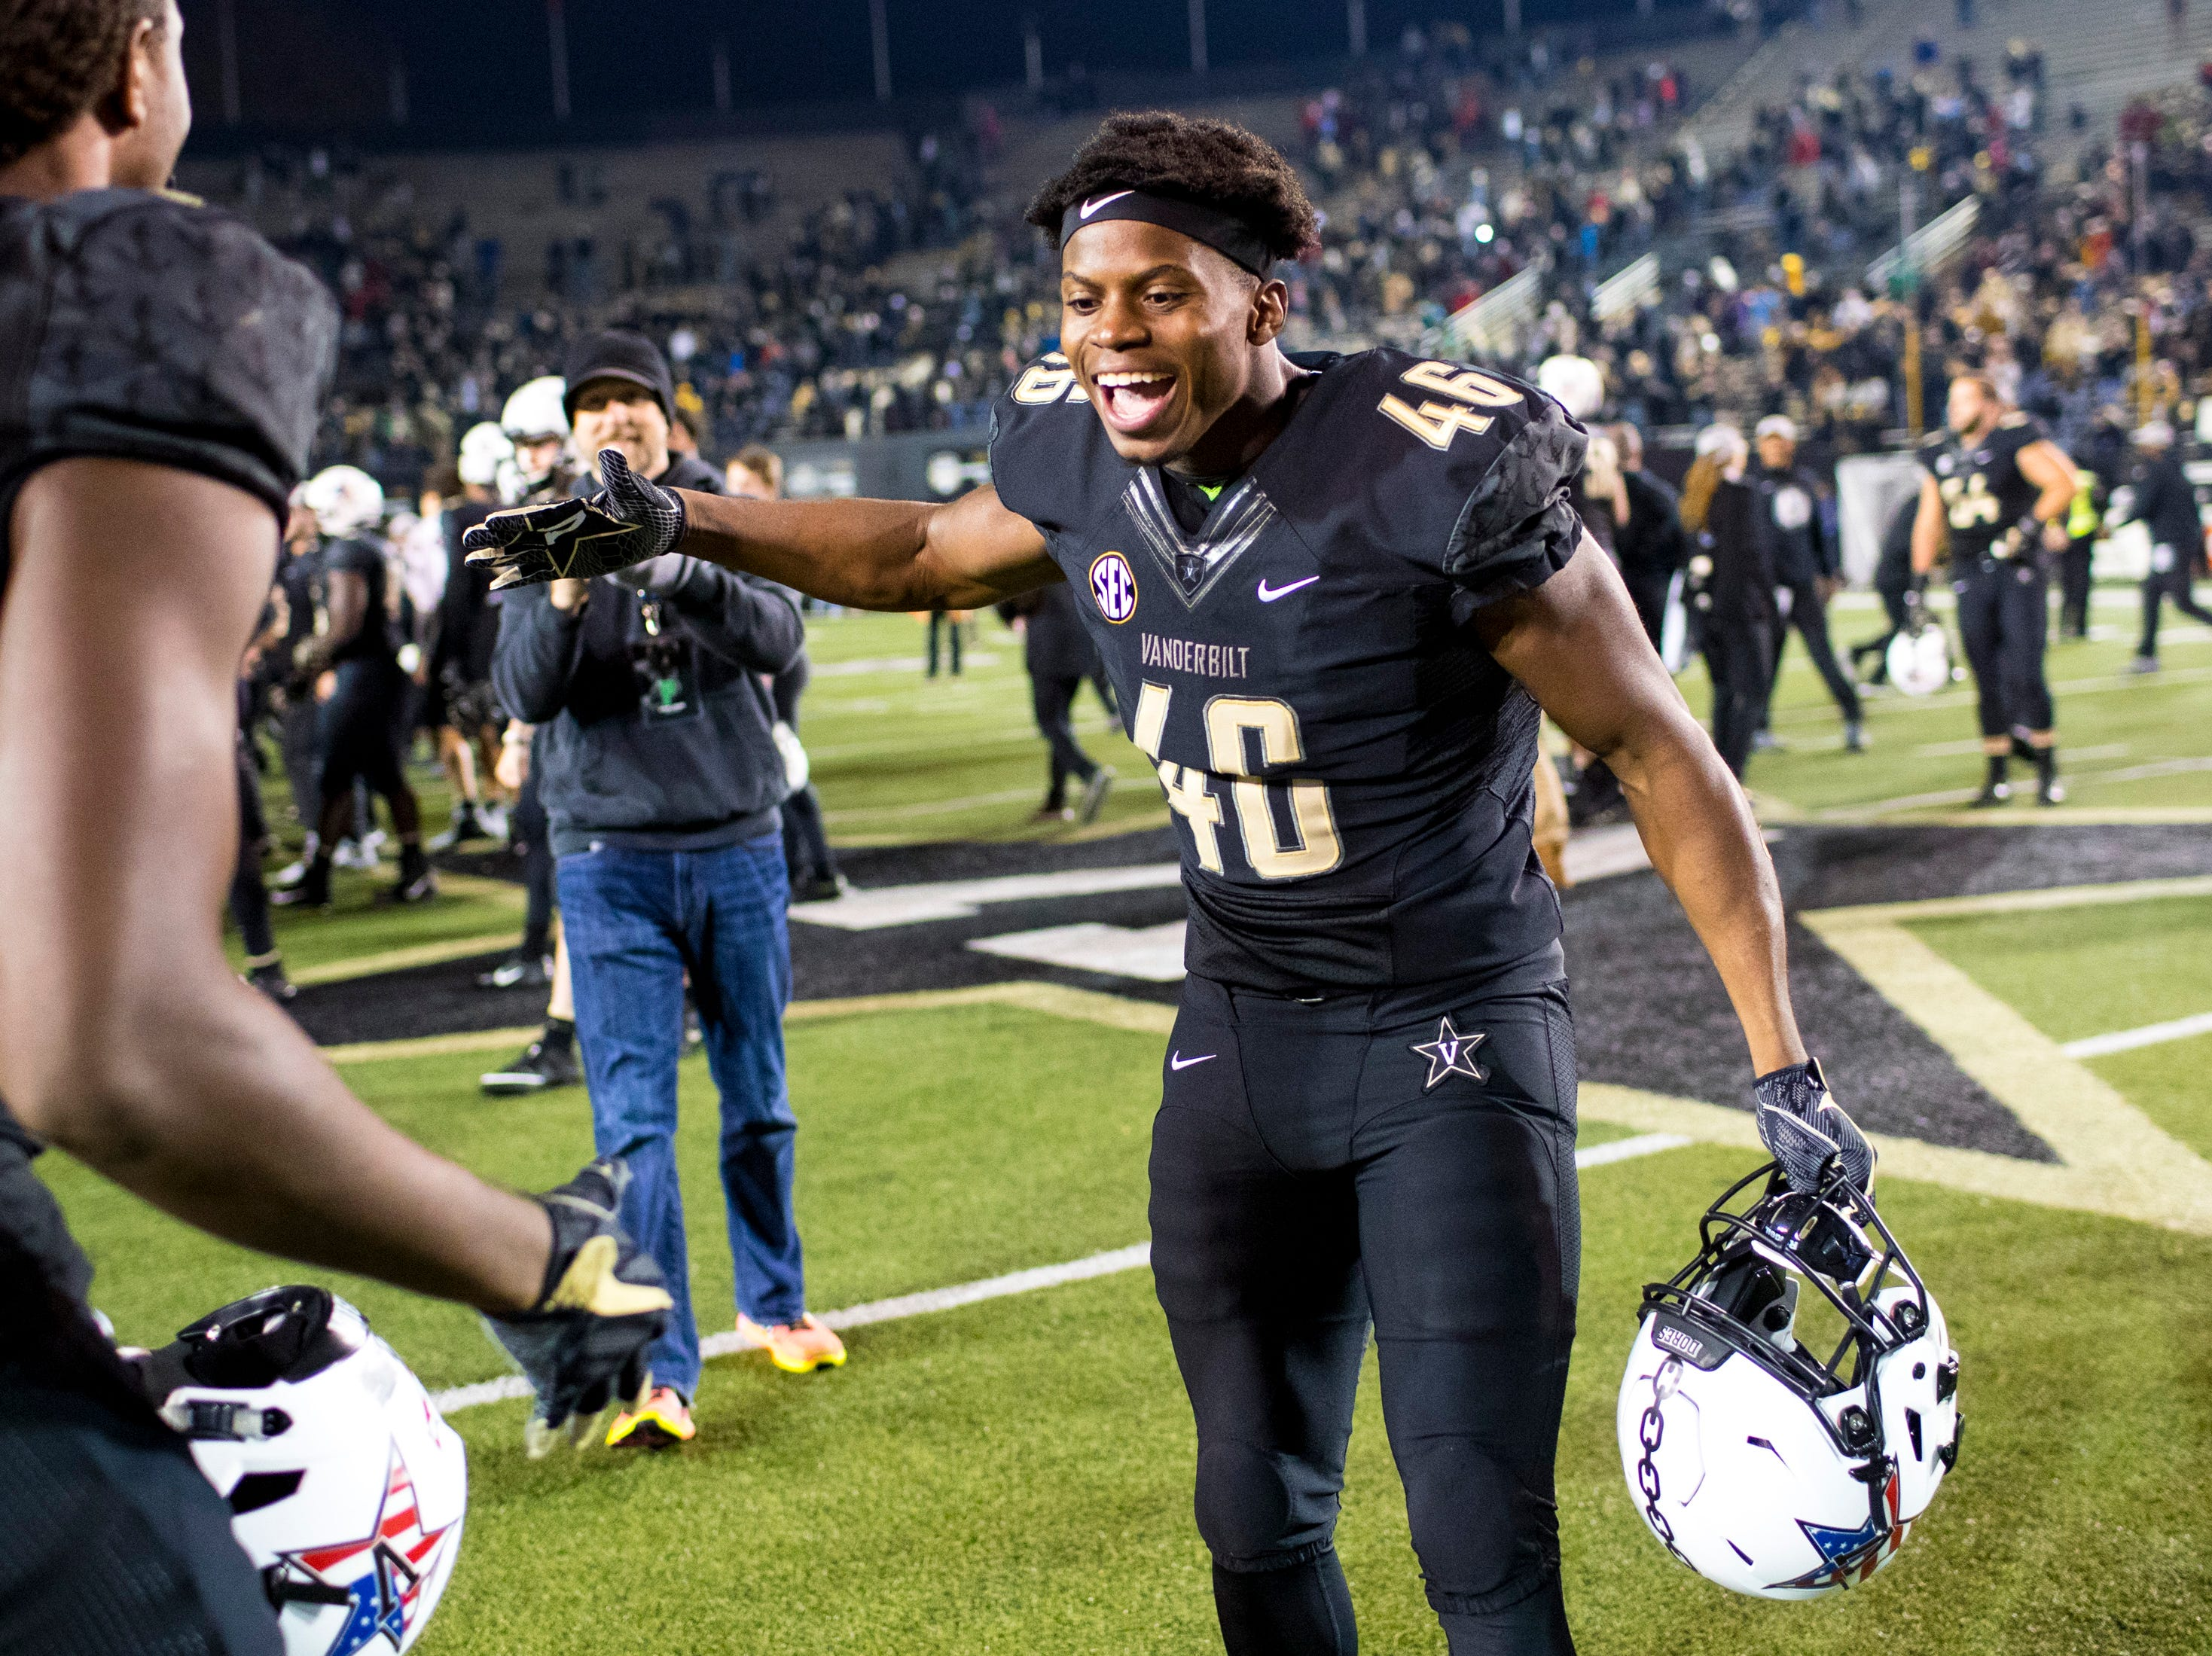 Vanderbilt wide receiver Keithian Starling (46) celebrates after Vanderbilt's game against Ole Miss at Vanderbilt Stadium in Nashville on Saturday, Nov. 17, 2018.